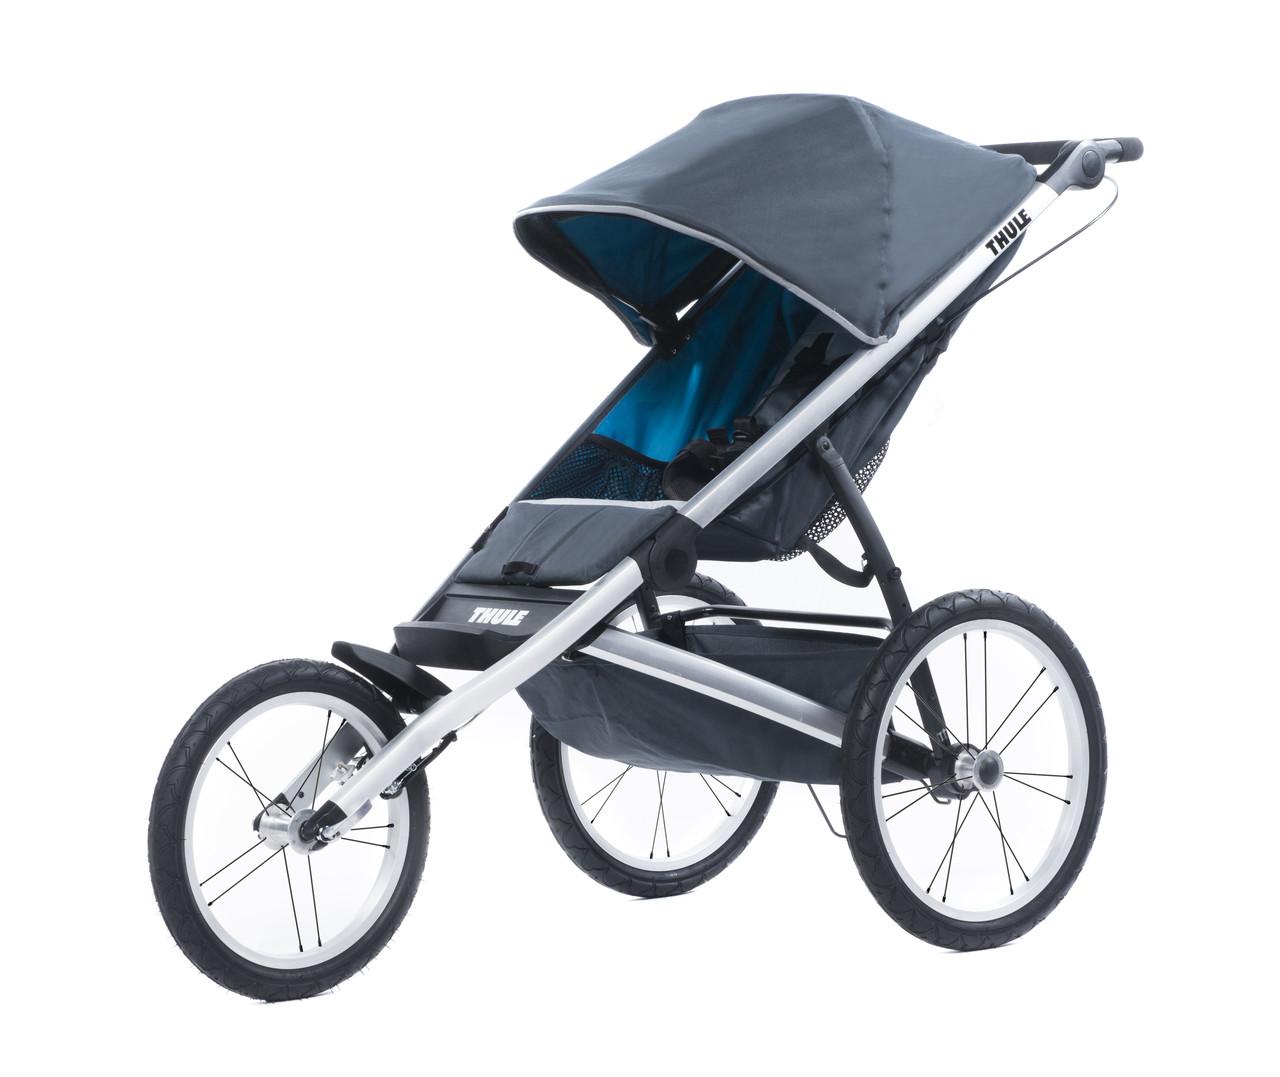 THULE Glide 1 - прогулочная коляска для бега (цвет Dark Shadow)